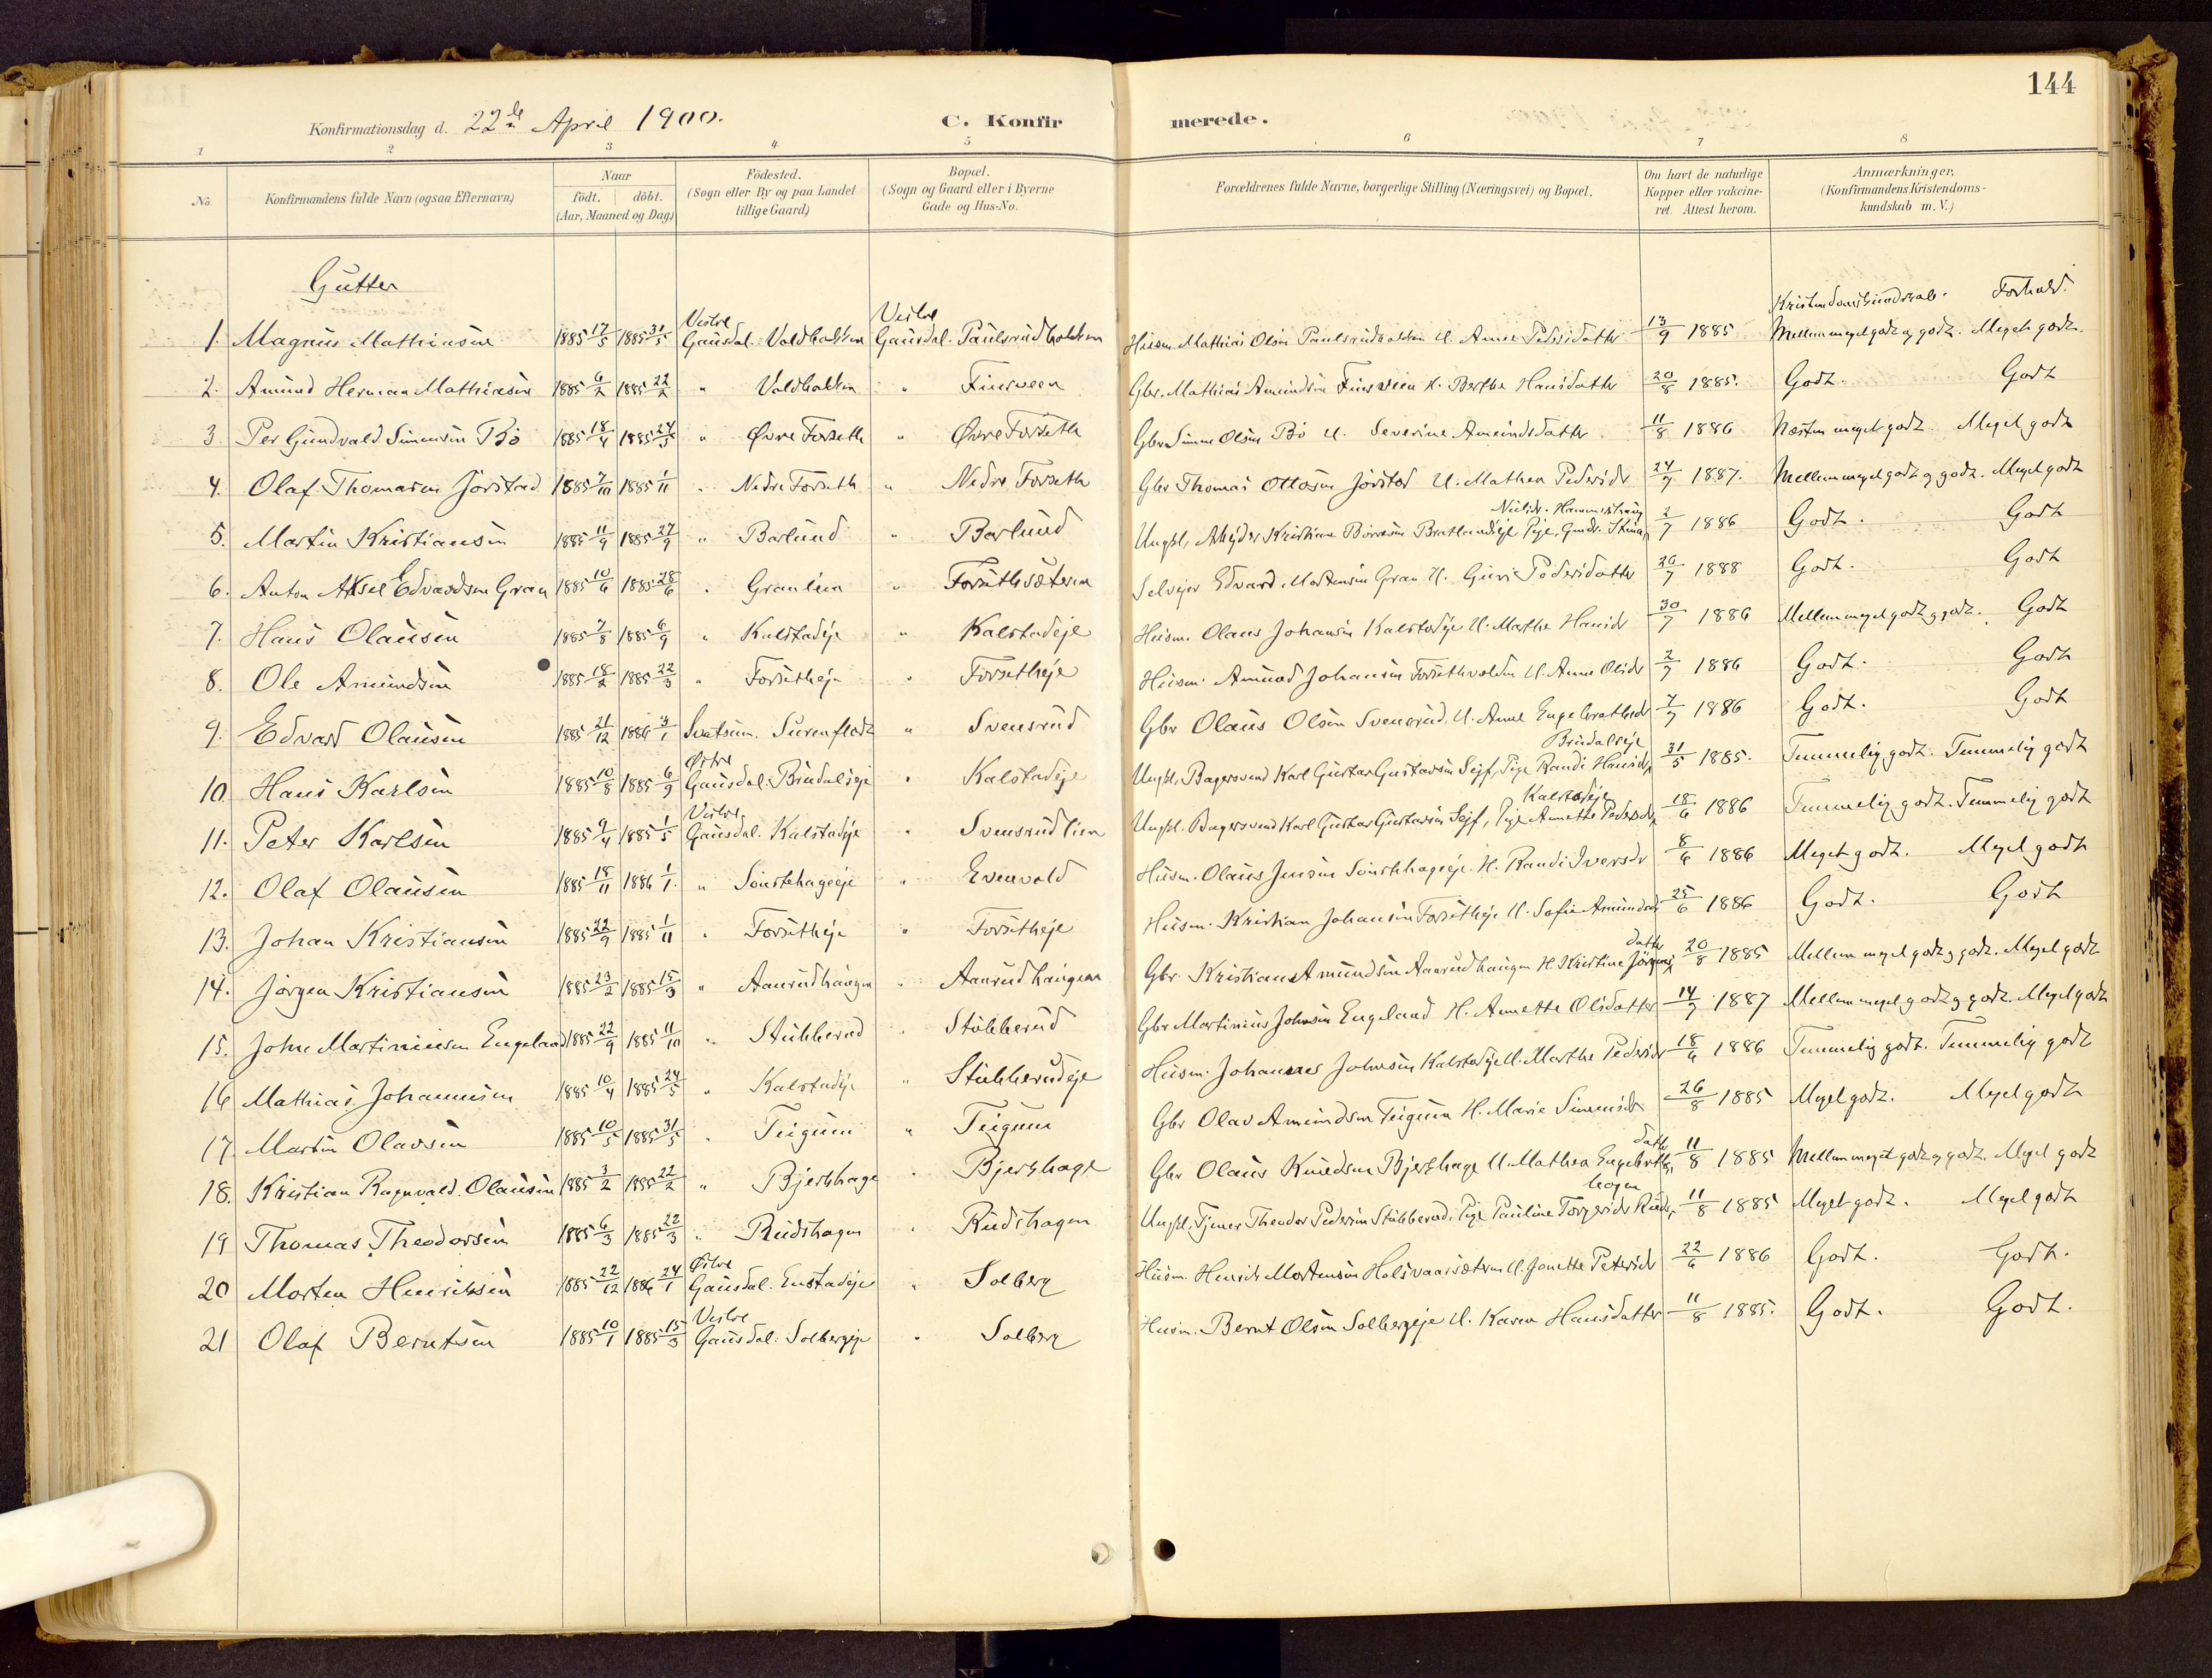 SAH, Vestre Gausdal prestekontor, Ministerialbok nr. 1, 1887-1914, s. 144